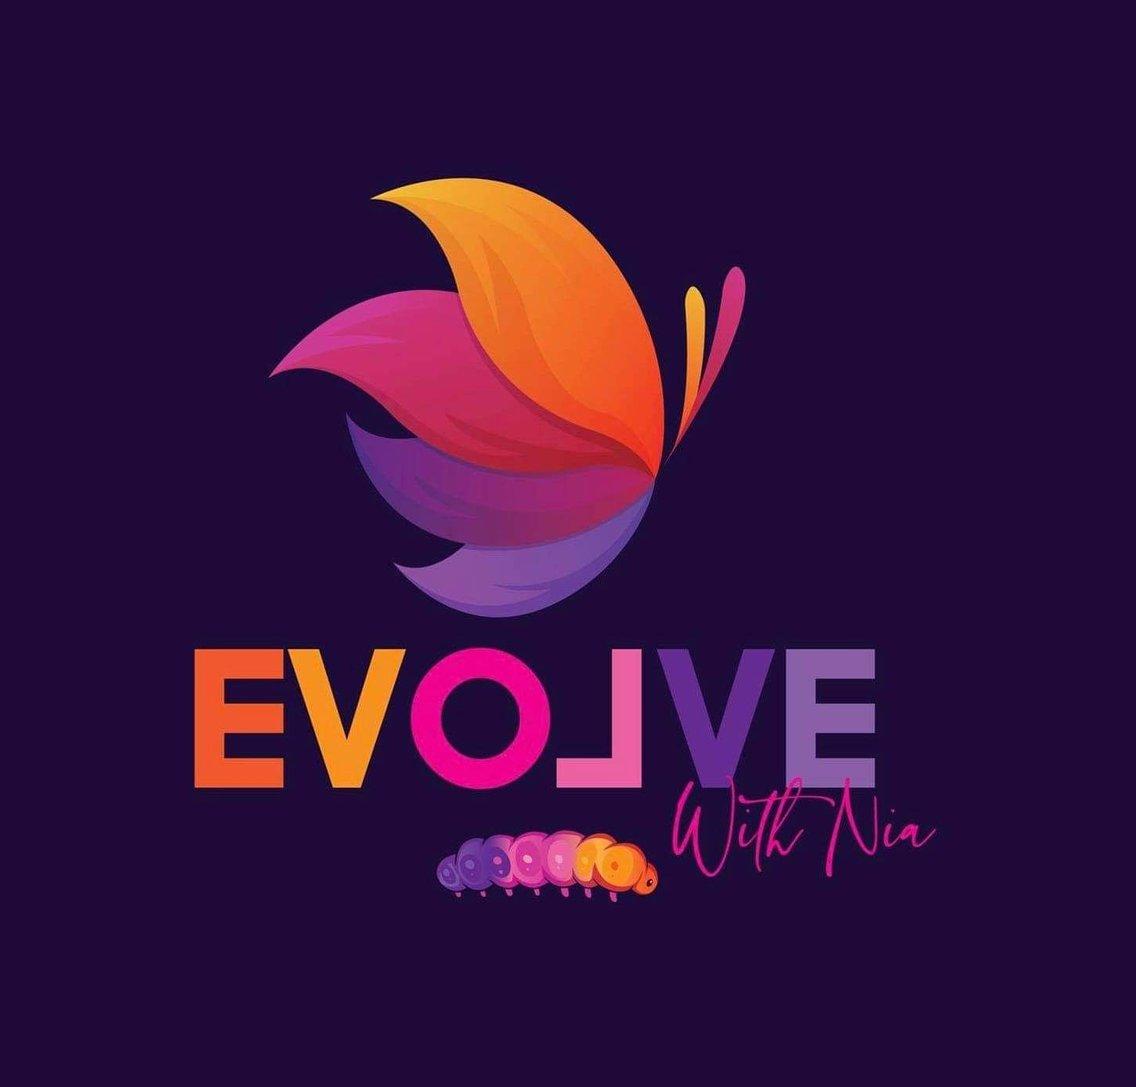 Evolve With Nia - immagine di copertina